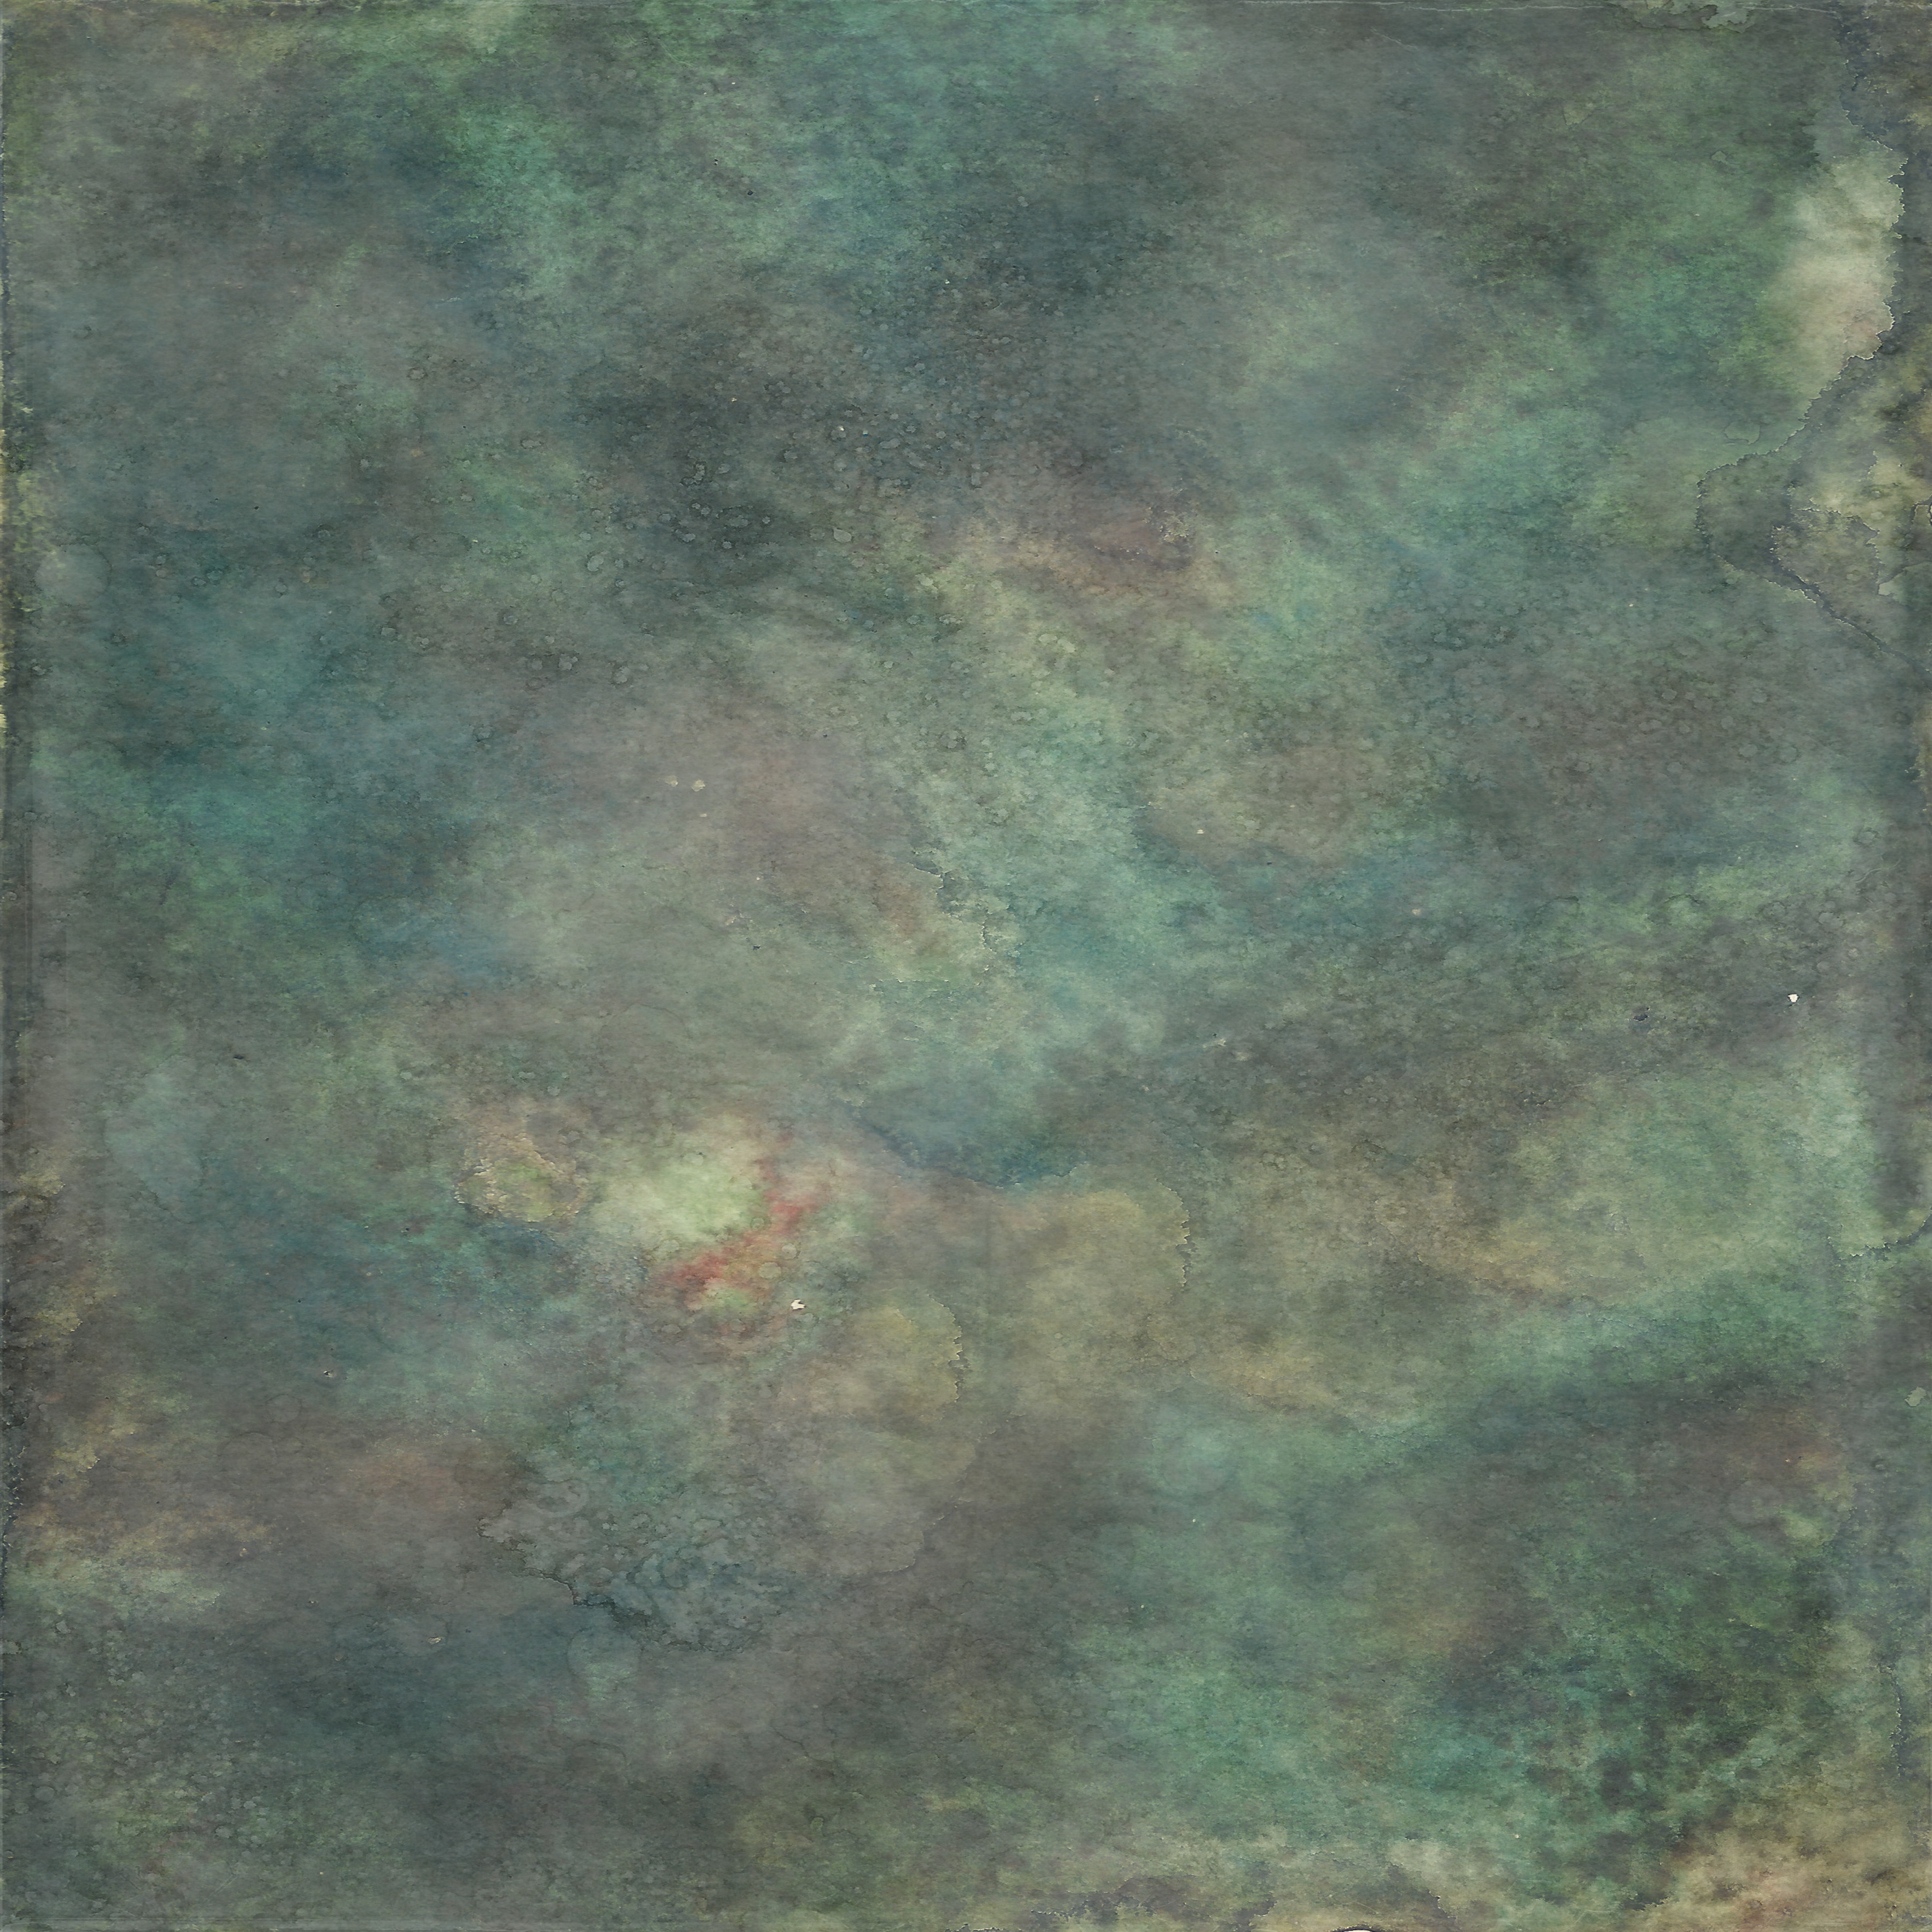 Paint Fine Art Texture, Abstract, Reflection, Grunge, Light, HQ Photo